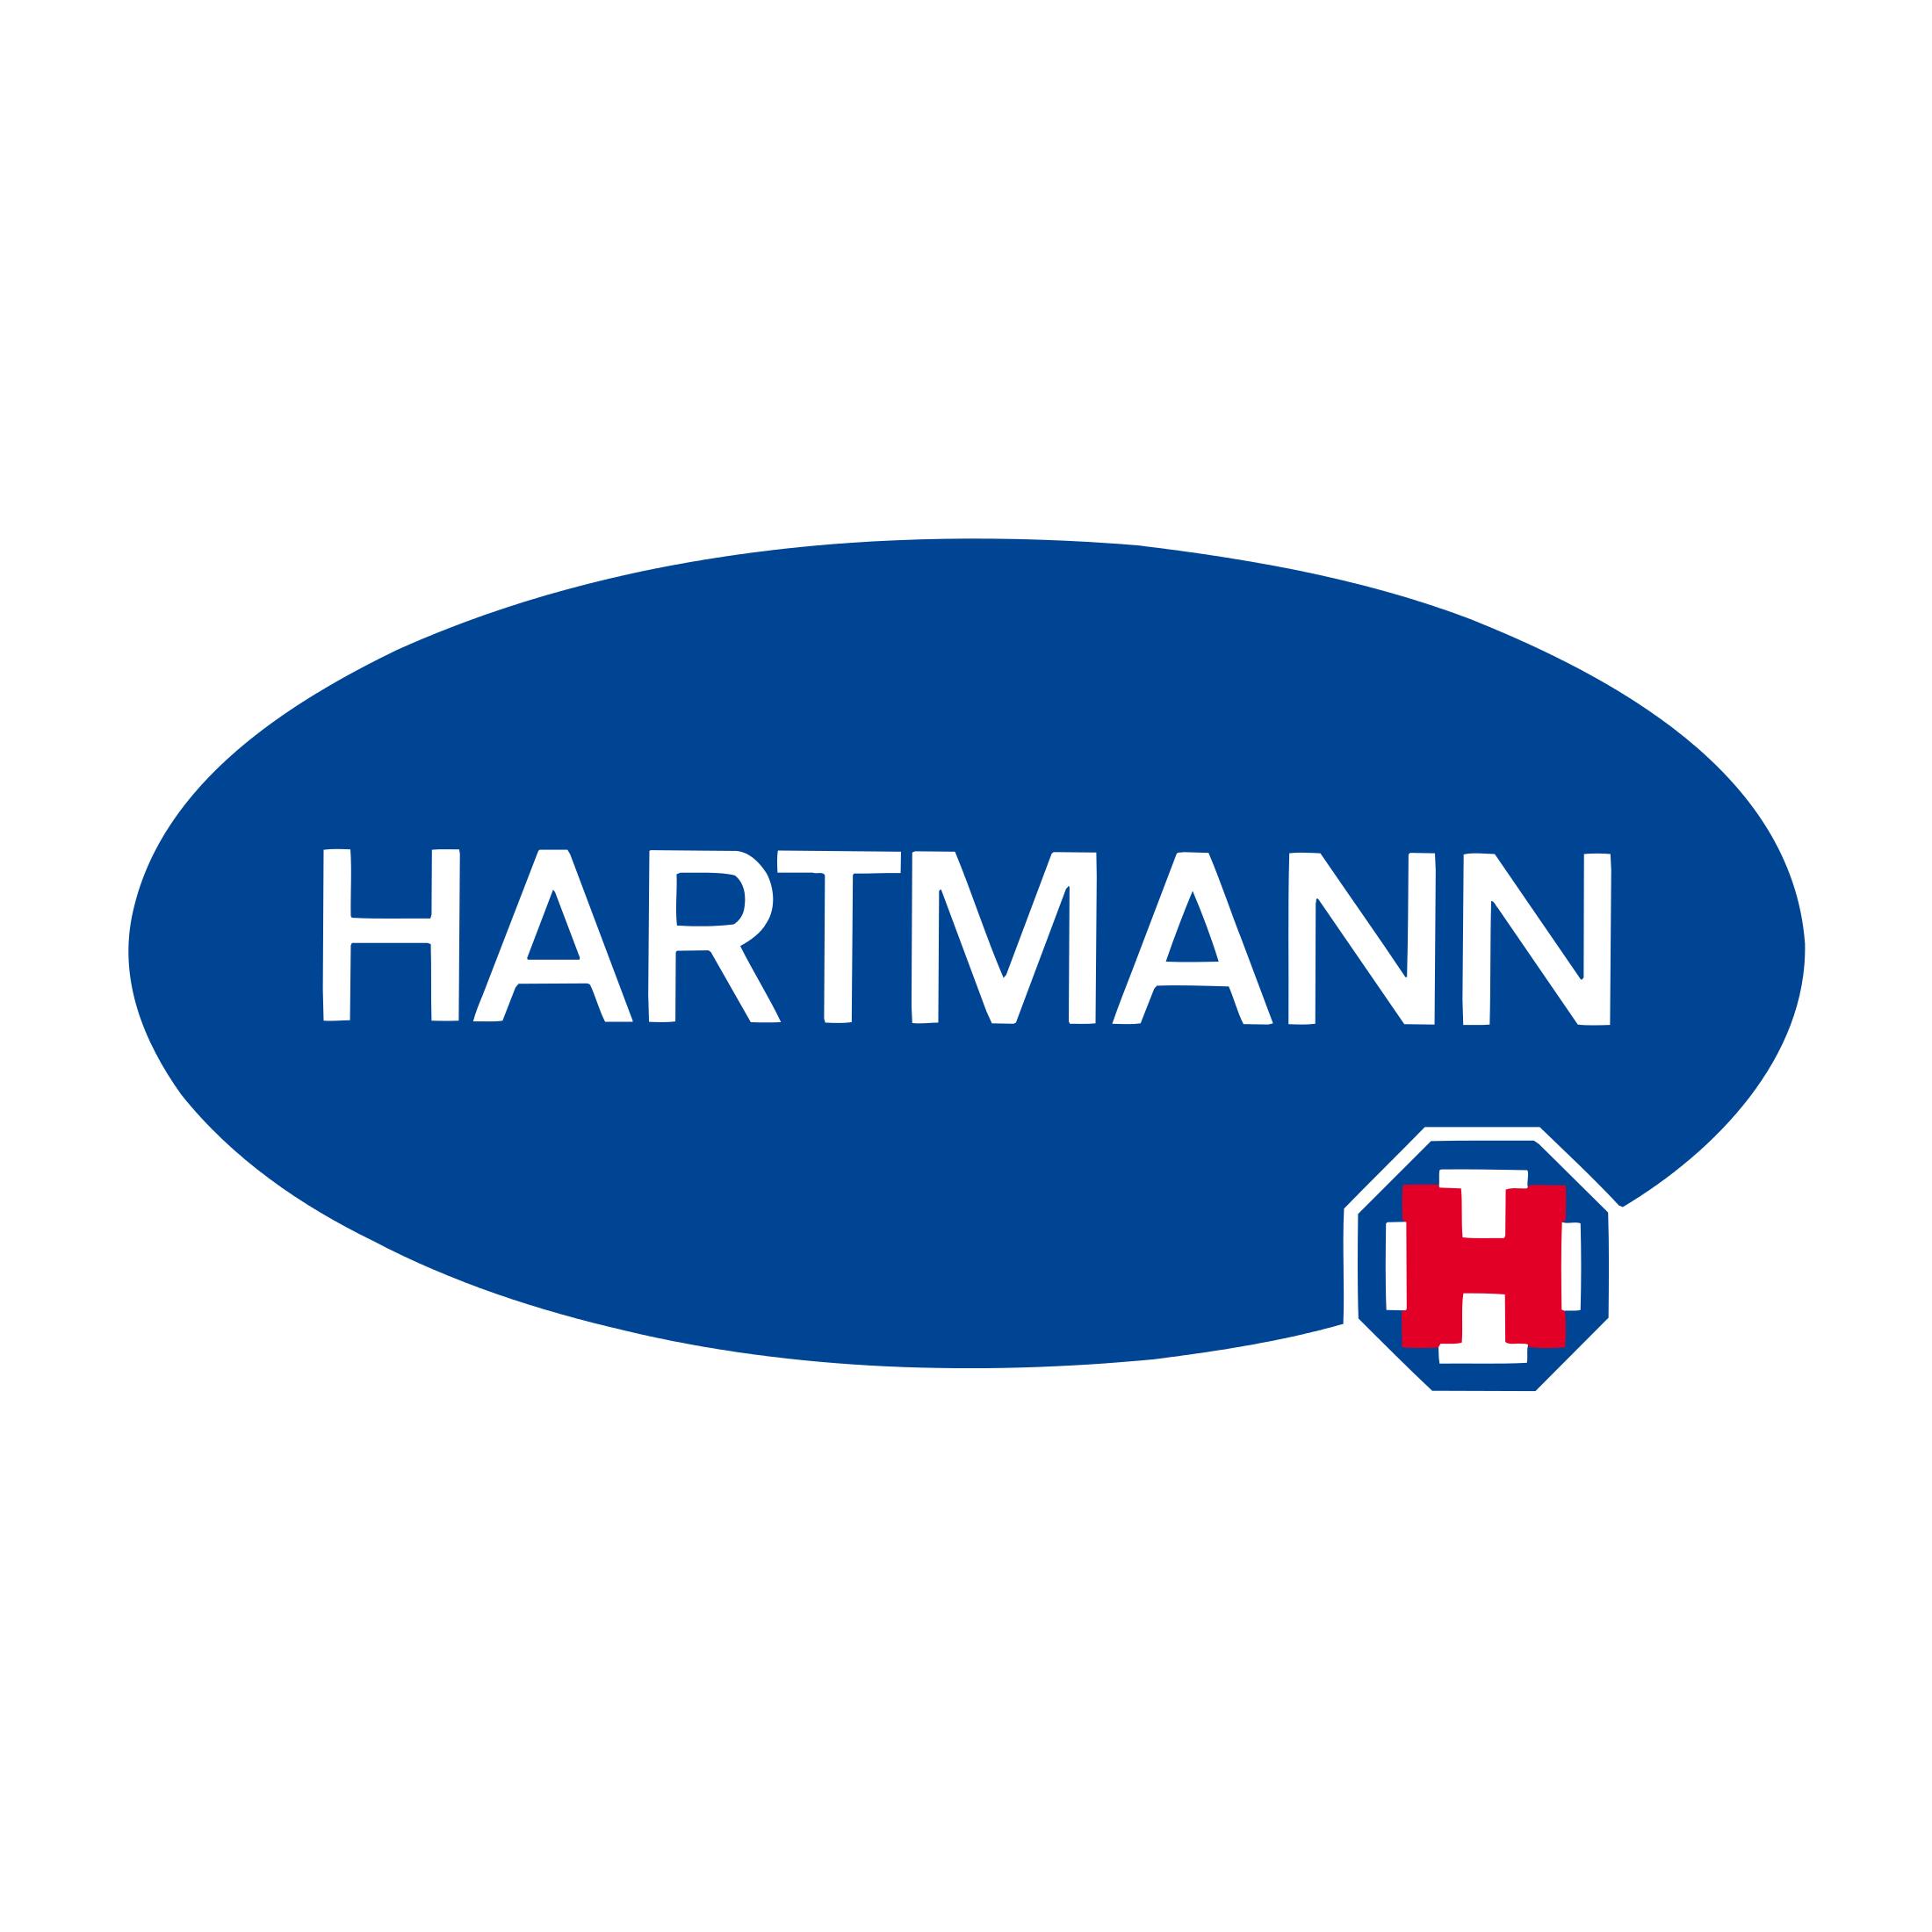 Hartmann